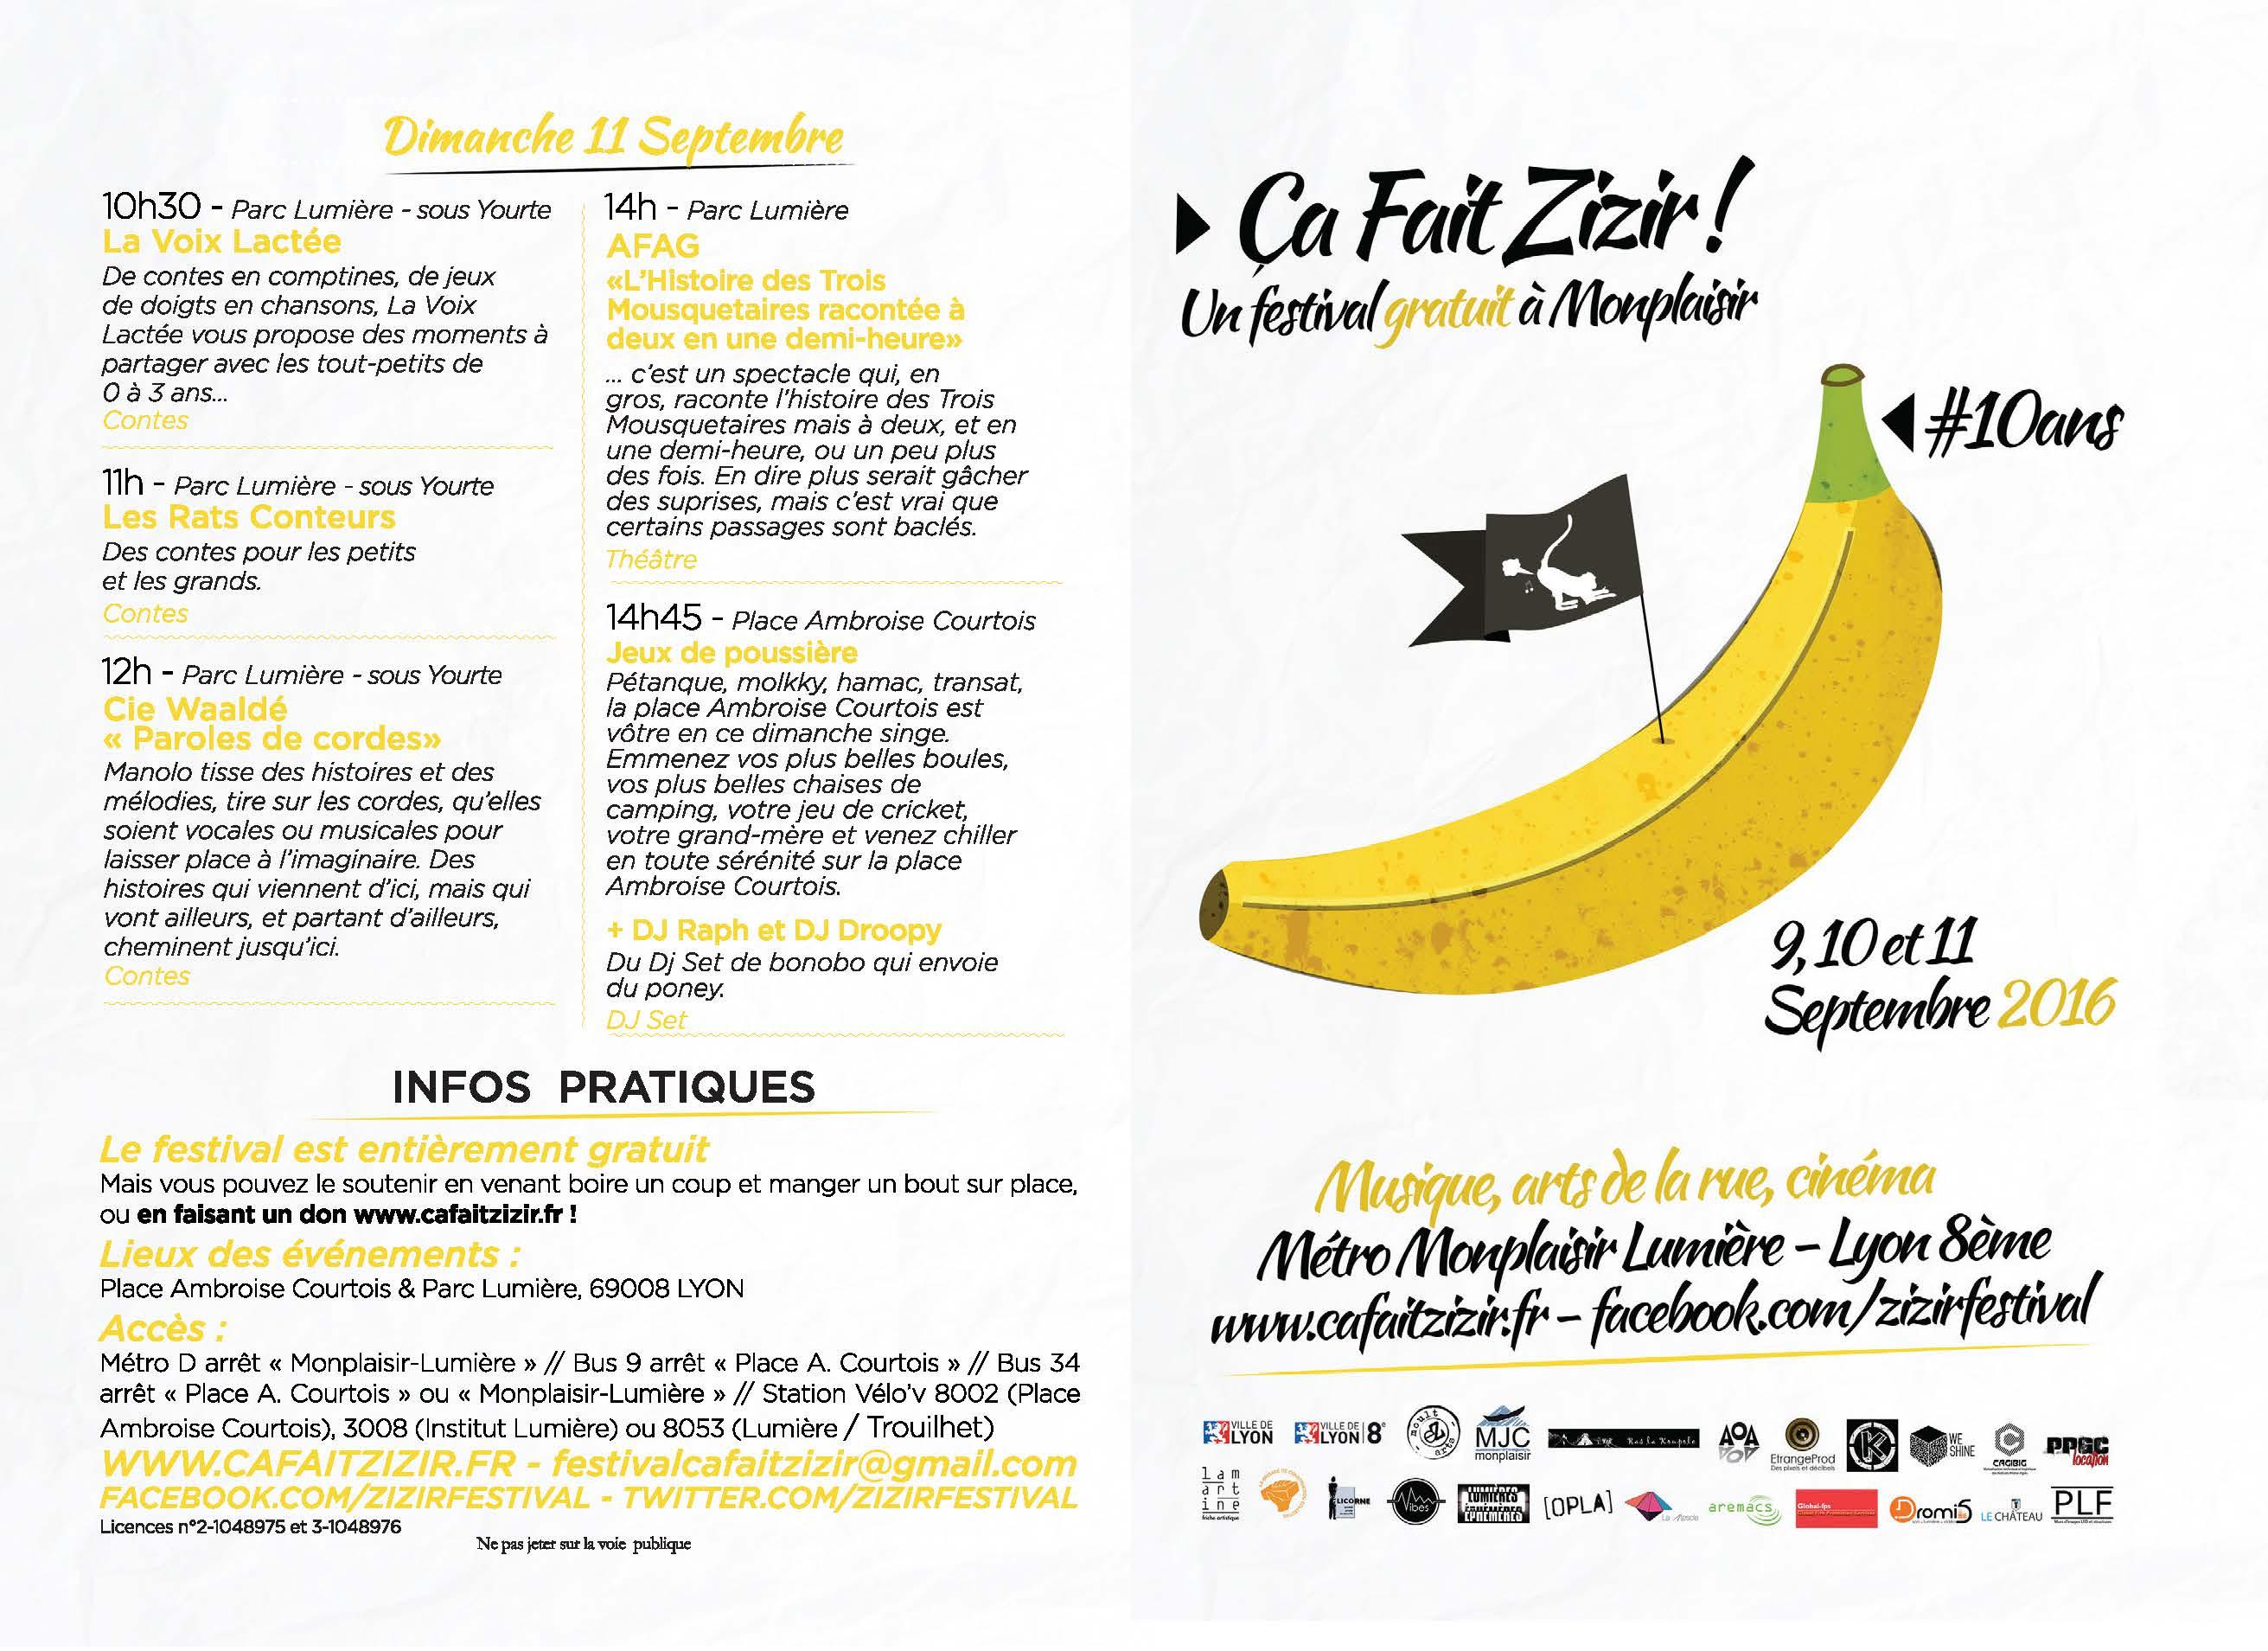 festival ca fait zizir 2016